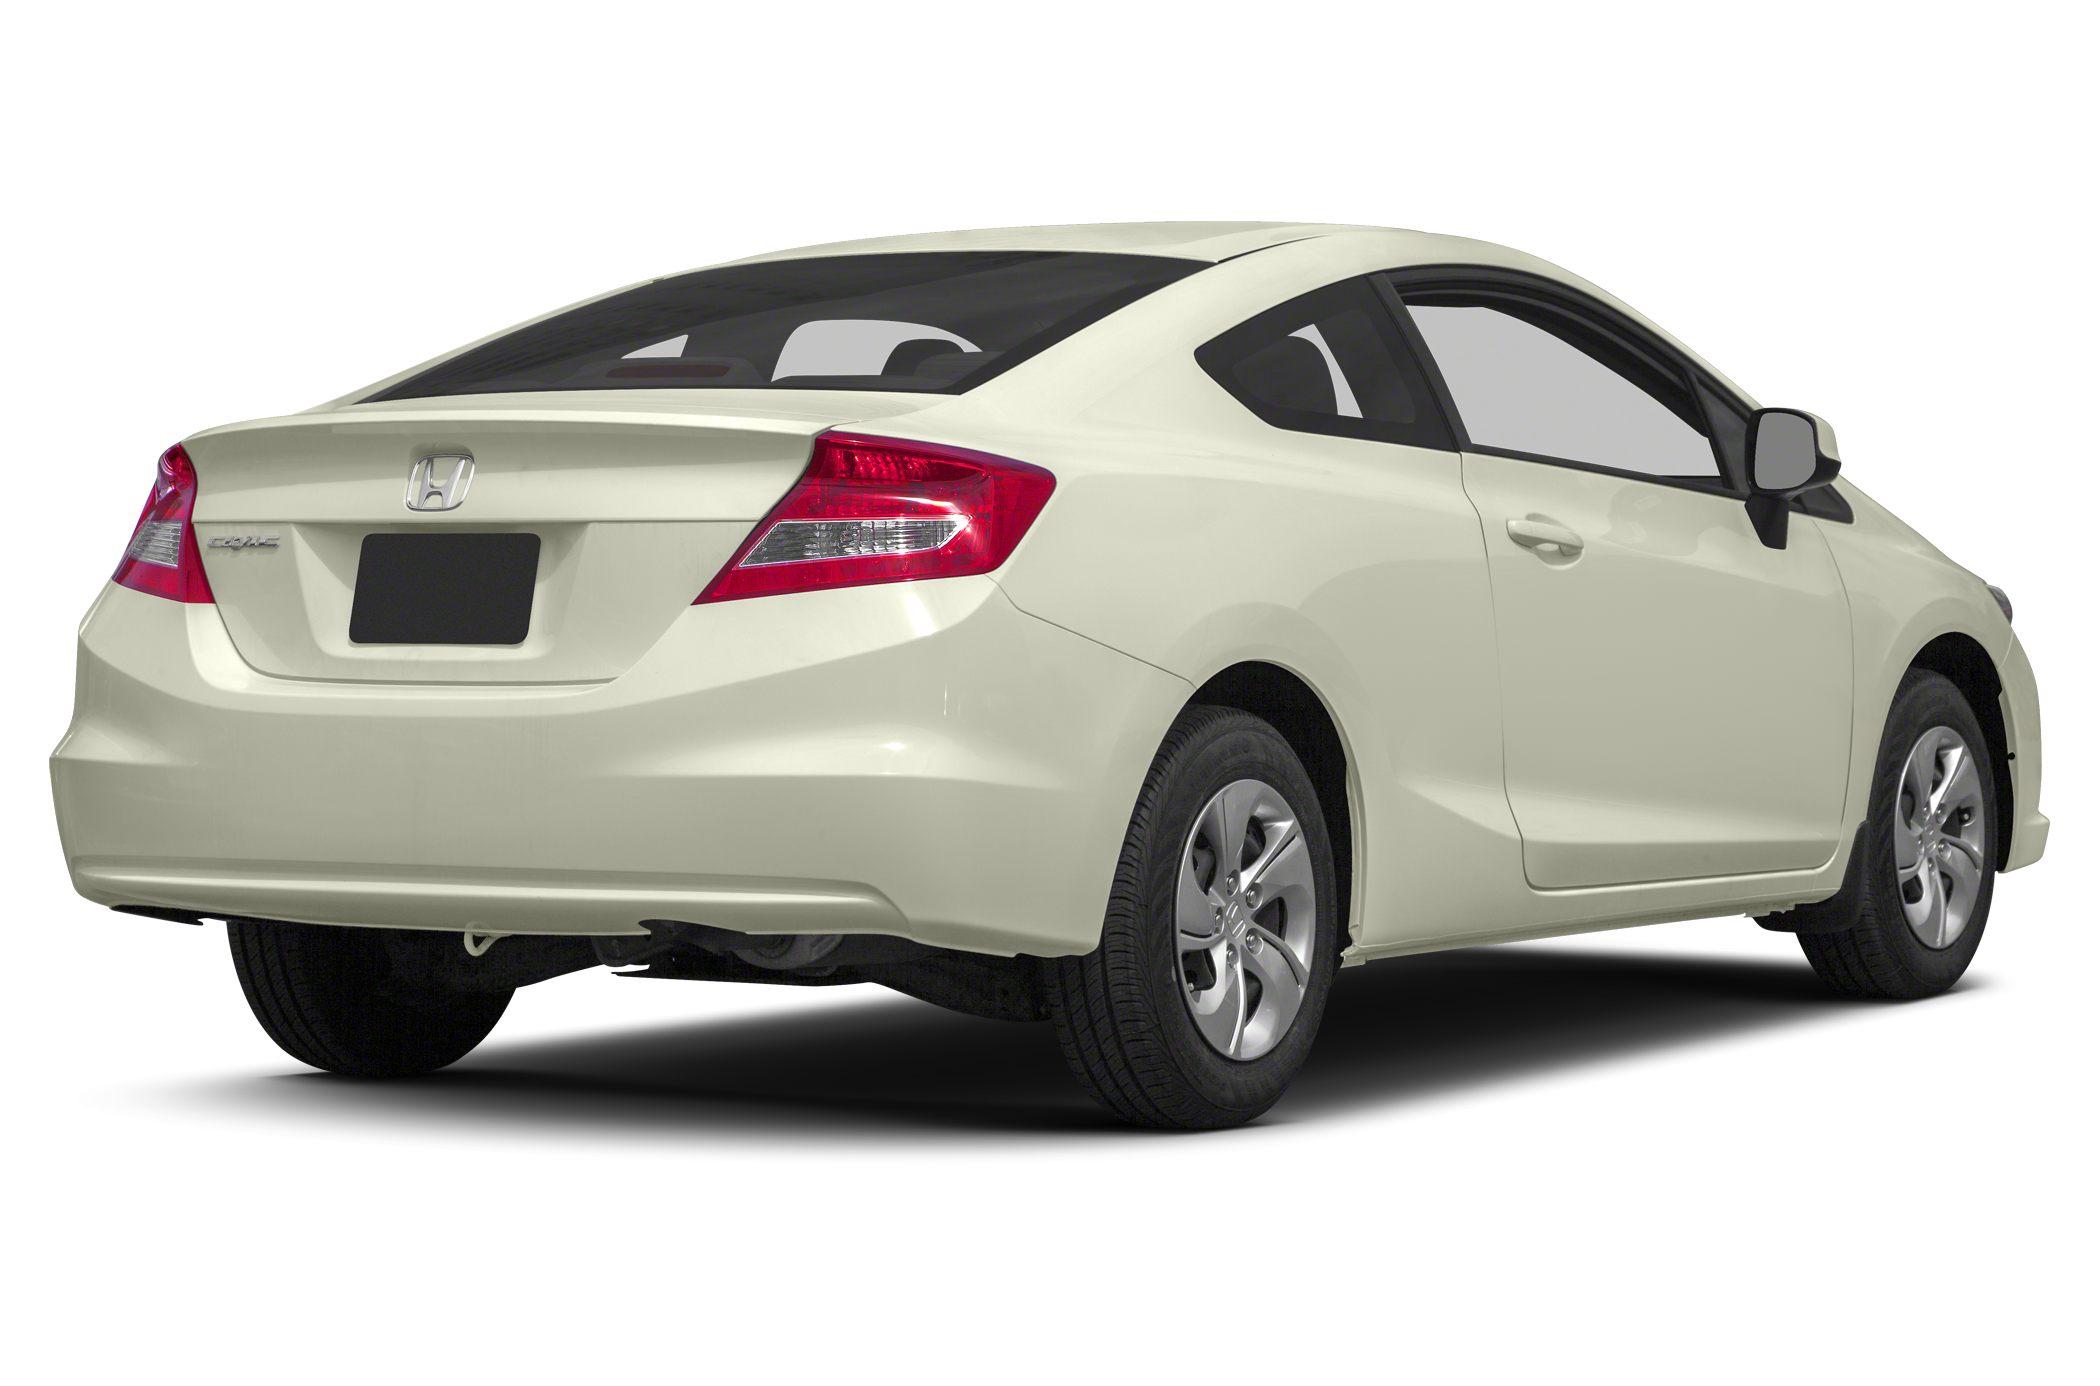 2013 Honda Civic LX Gray 2013 Honda Civic LX FWD Compact 5-Speed Automatic 18L I4 SOHC 16V i-VTEC